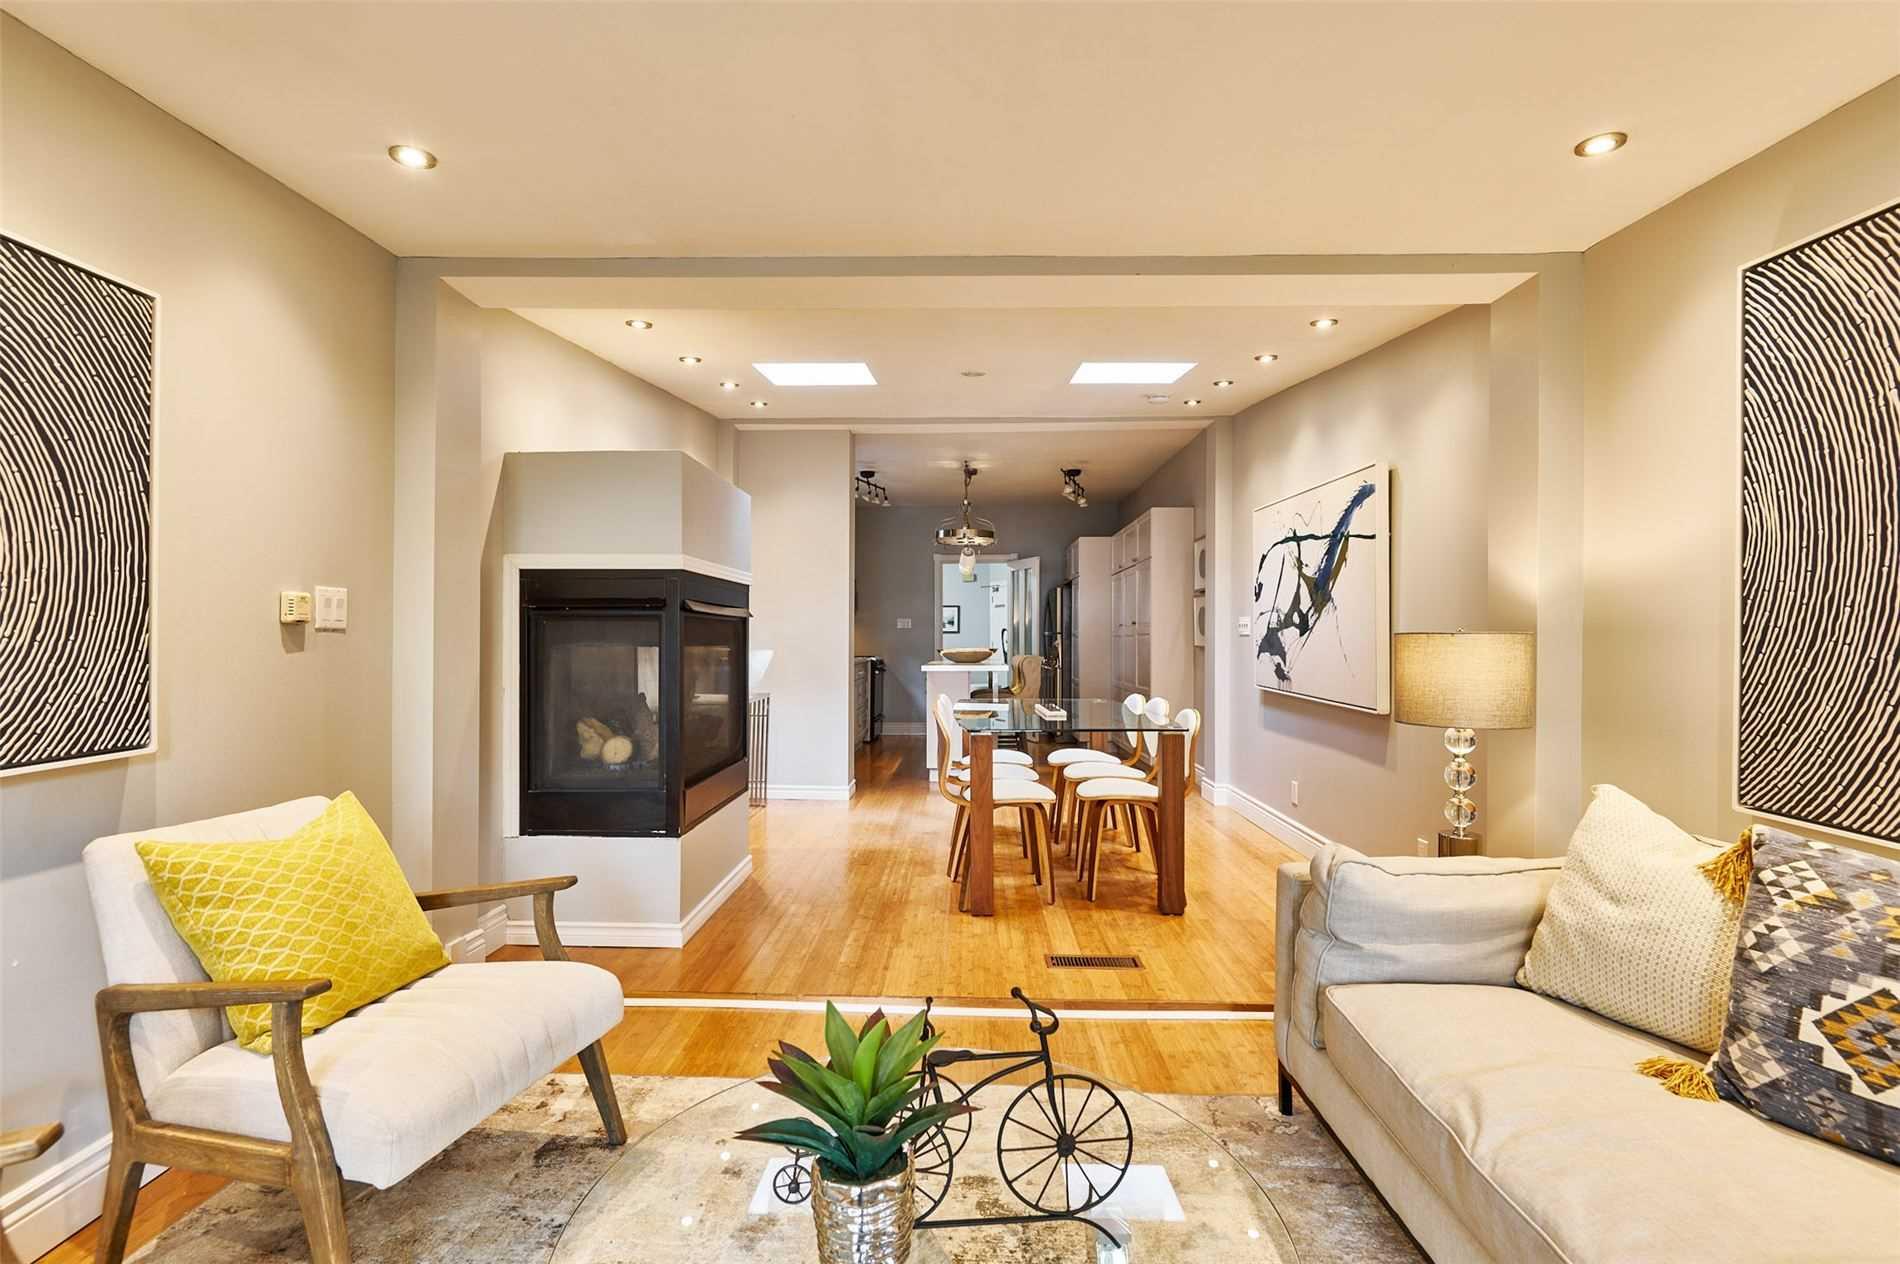 Detached house For Sale In Toronto - 107 Hocken Ave, Toronto, Ontario, Canada M6G2K1 , 2 Bedrooms Bedrooms, ,3 BathroomsBathrooms,Detached,For Sale,Hocken